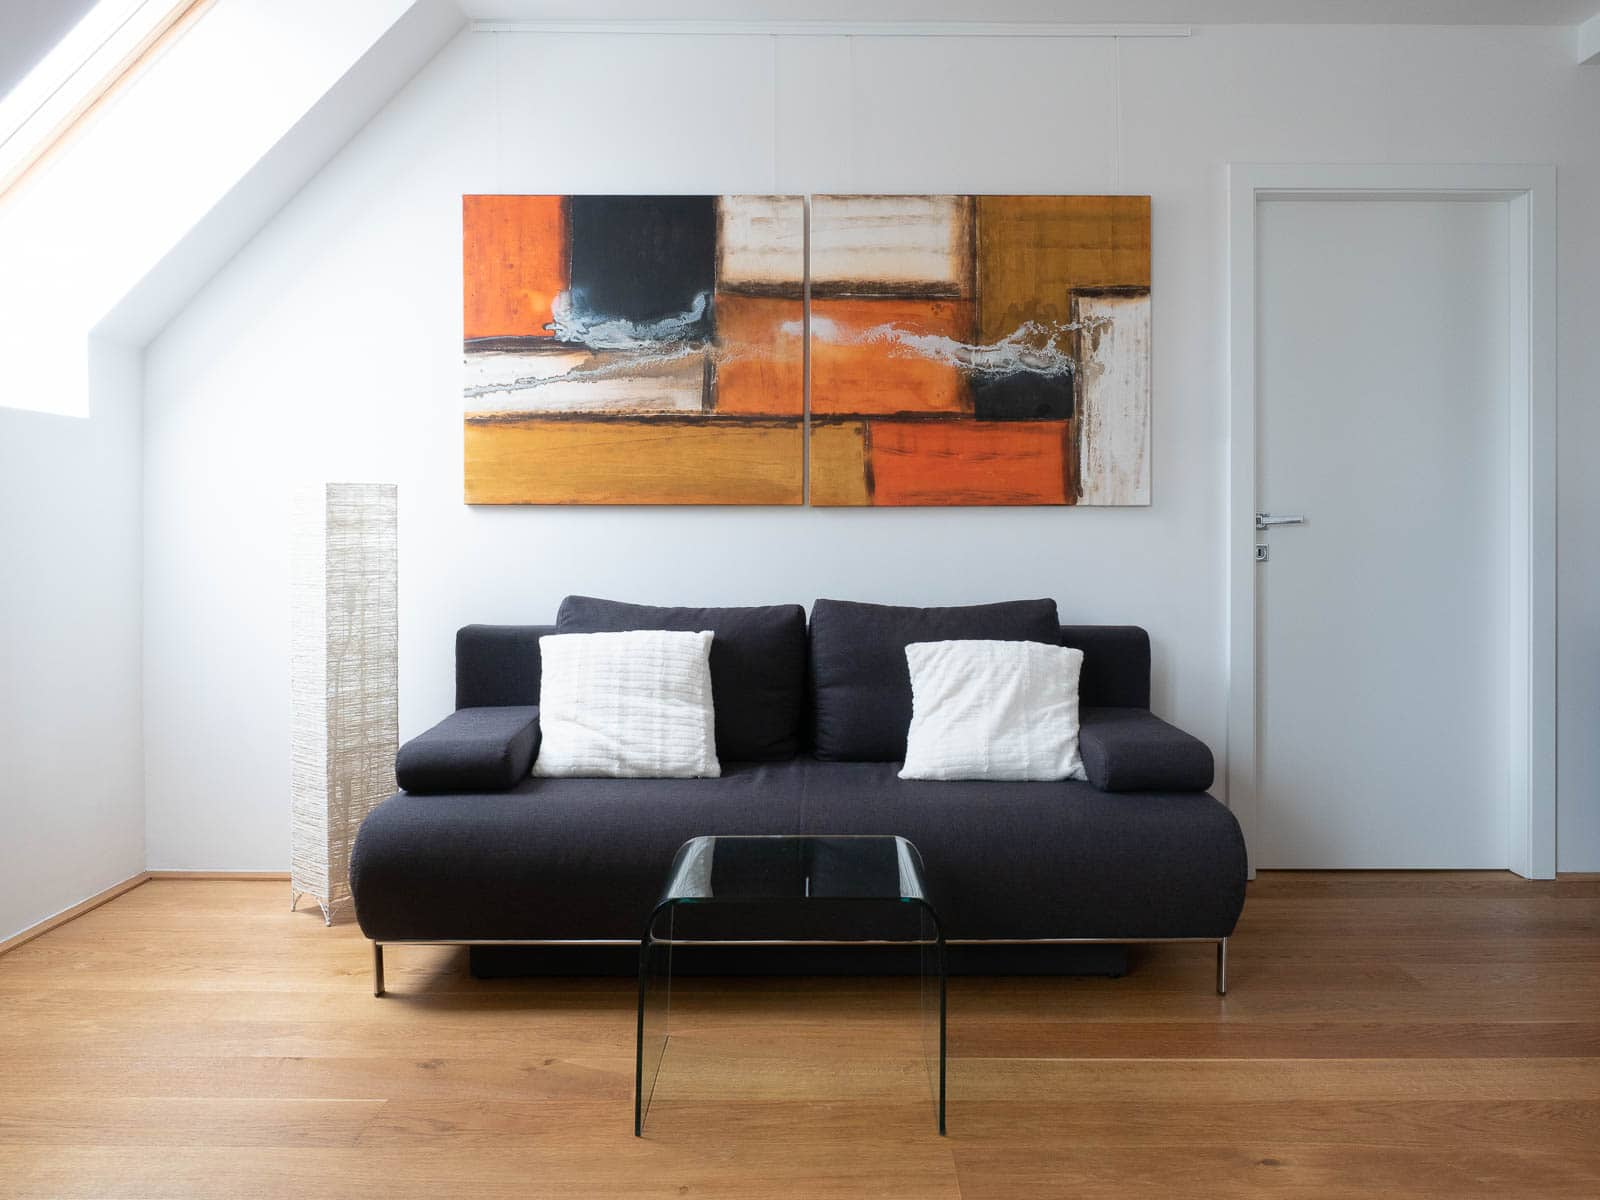 Acrylbild 'Exportation' – 200 x 90 cm zweitelig